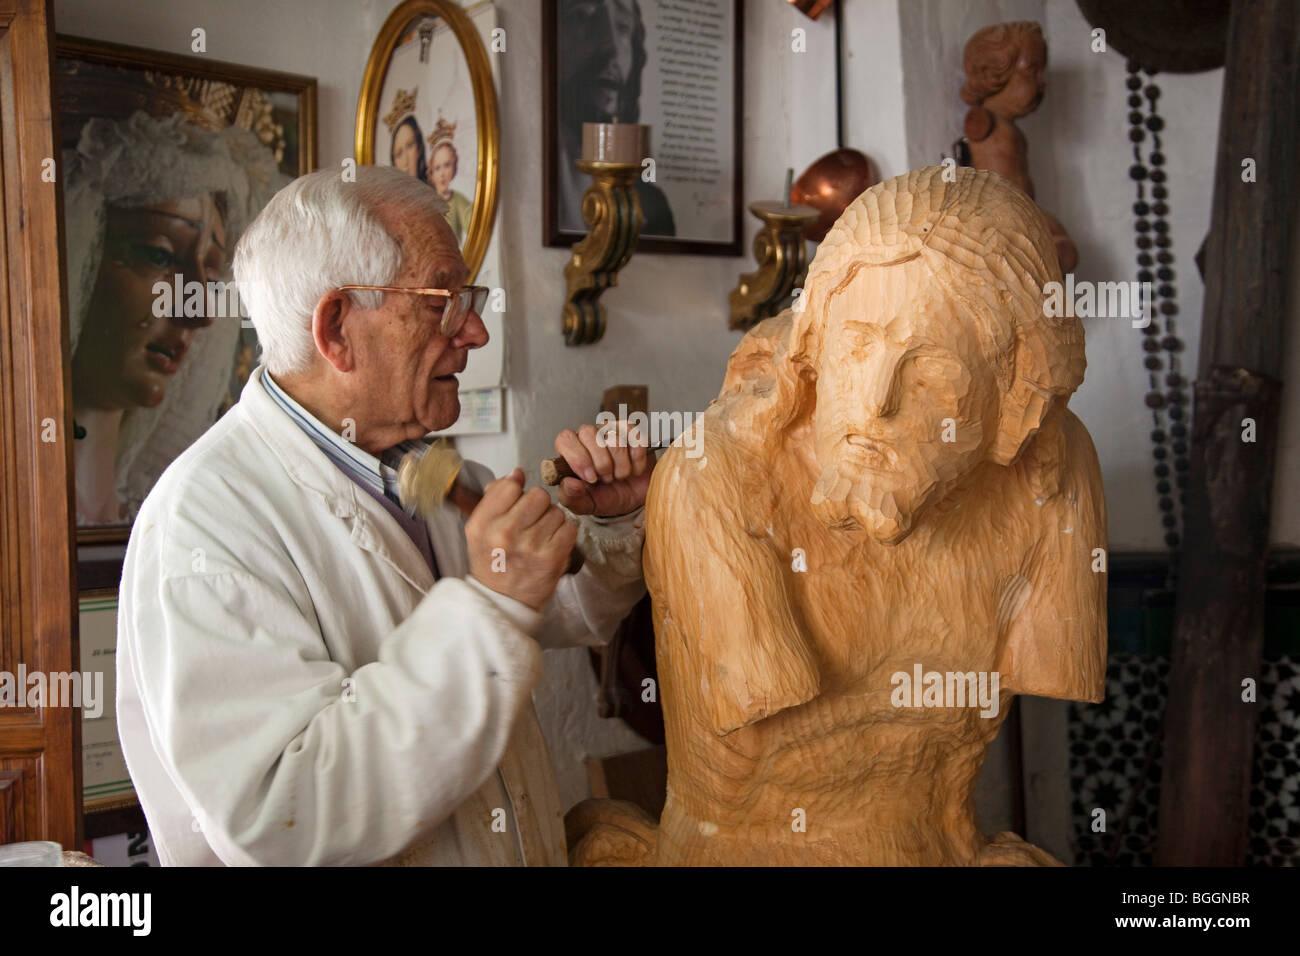 Imaginero en su taller de Priego, Córdoba, Andalucía, España Imaging in his workshop in Priego, Córdoba, - Stock Image